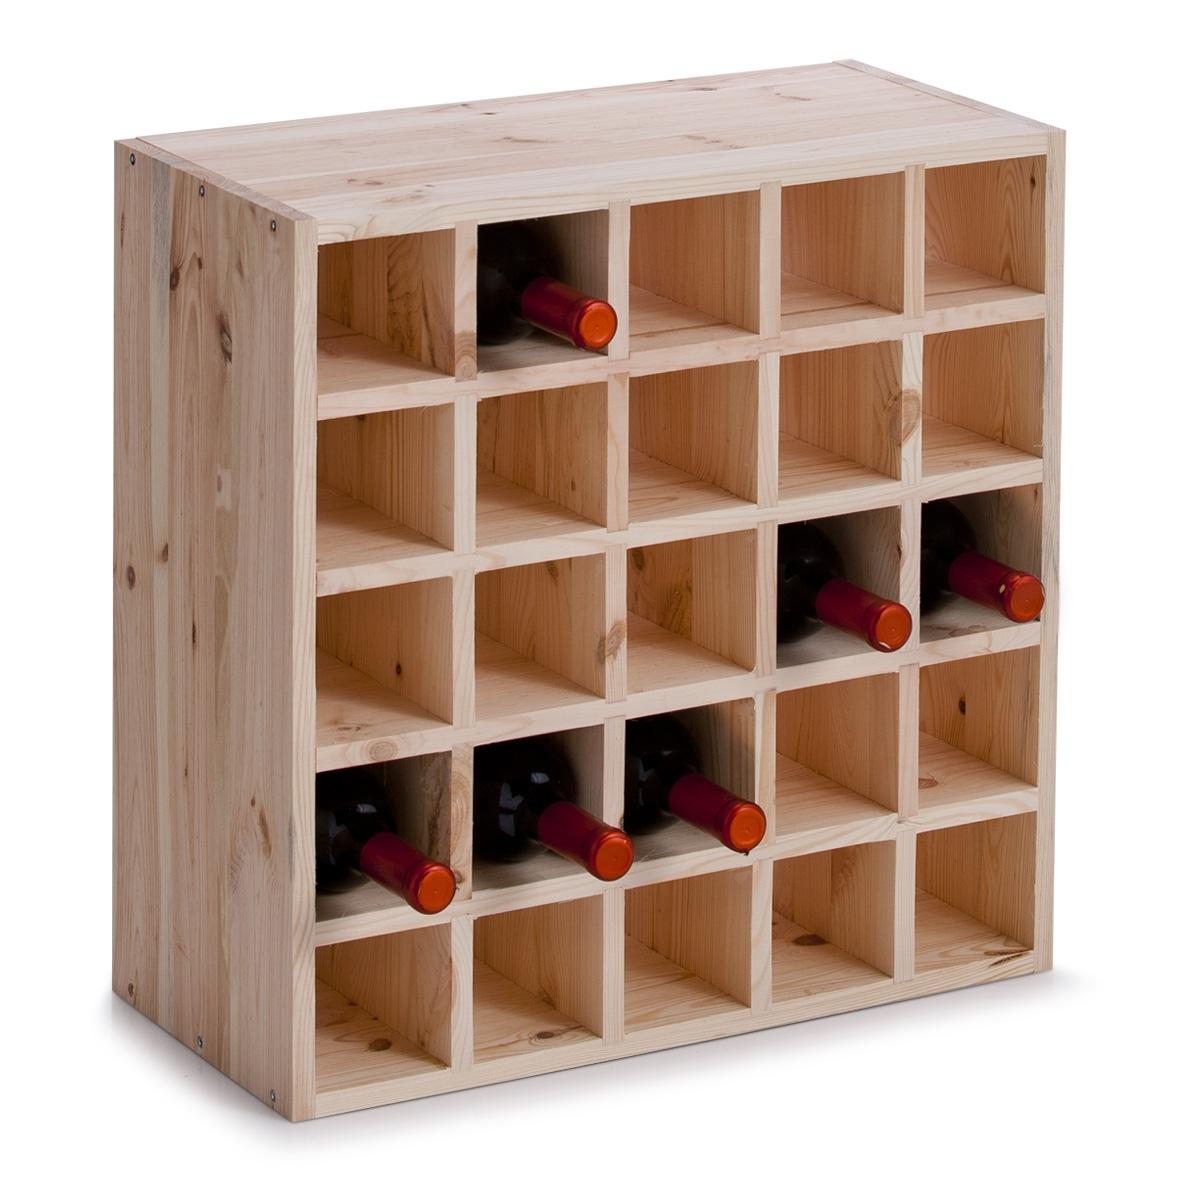 Suport din lemn de pin pentru 25 sticle Rack Square Natural, l52xA25xH52 cm imagine